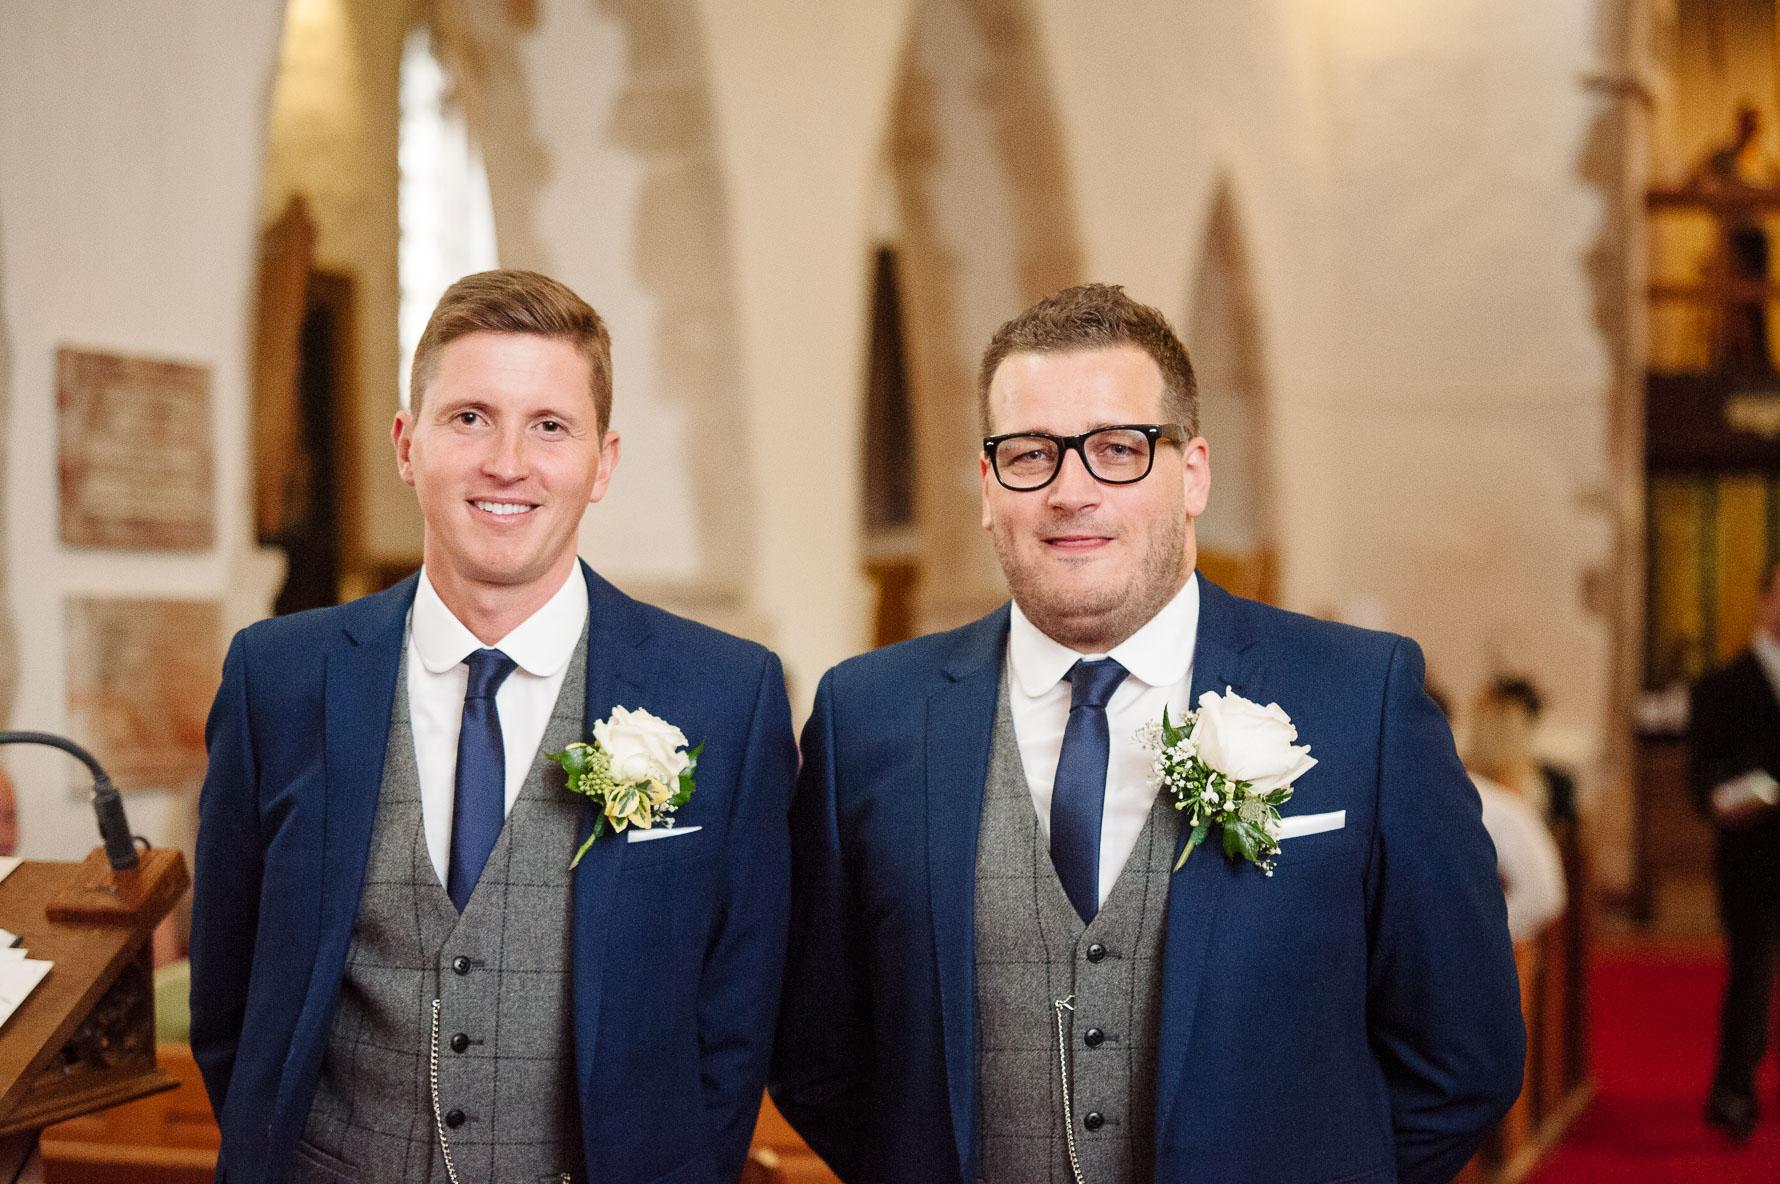 Canterbury Cathedral Lodge Wedding18-20141004 0355